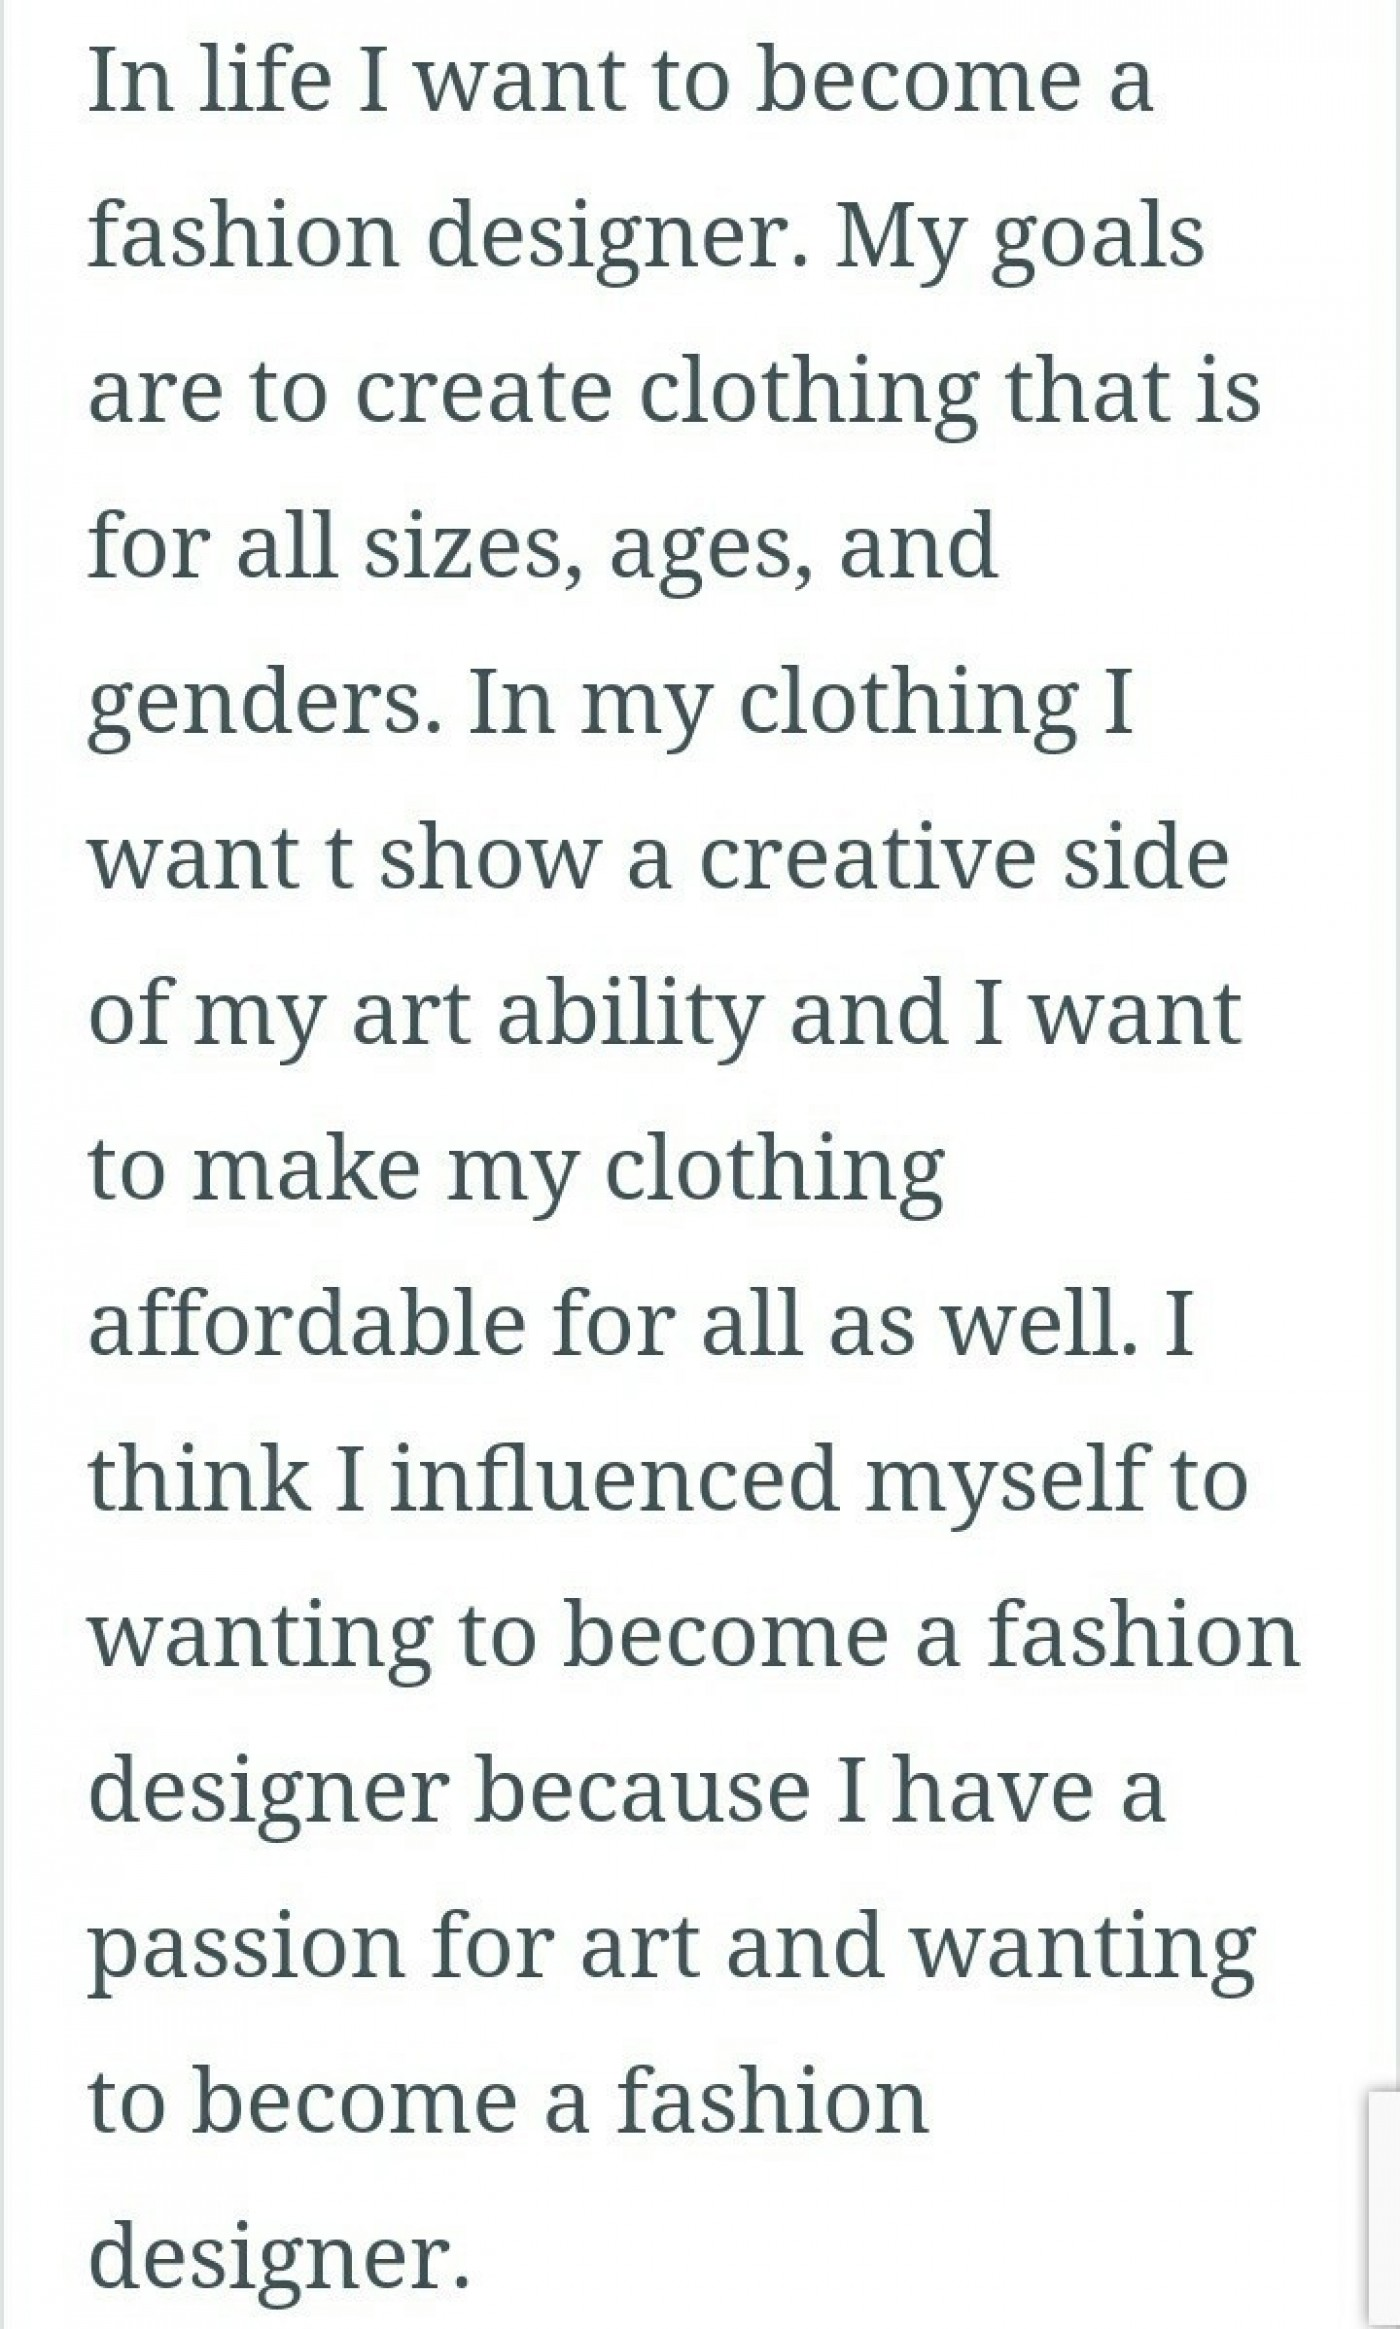 017 Essay Example Fashion Scholarshipfit12342c1600ssl1 On Thatsnotus